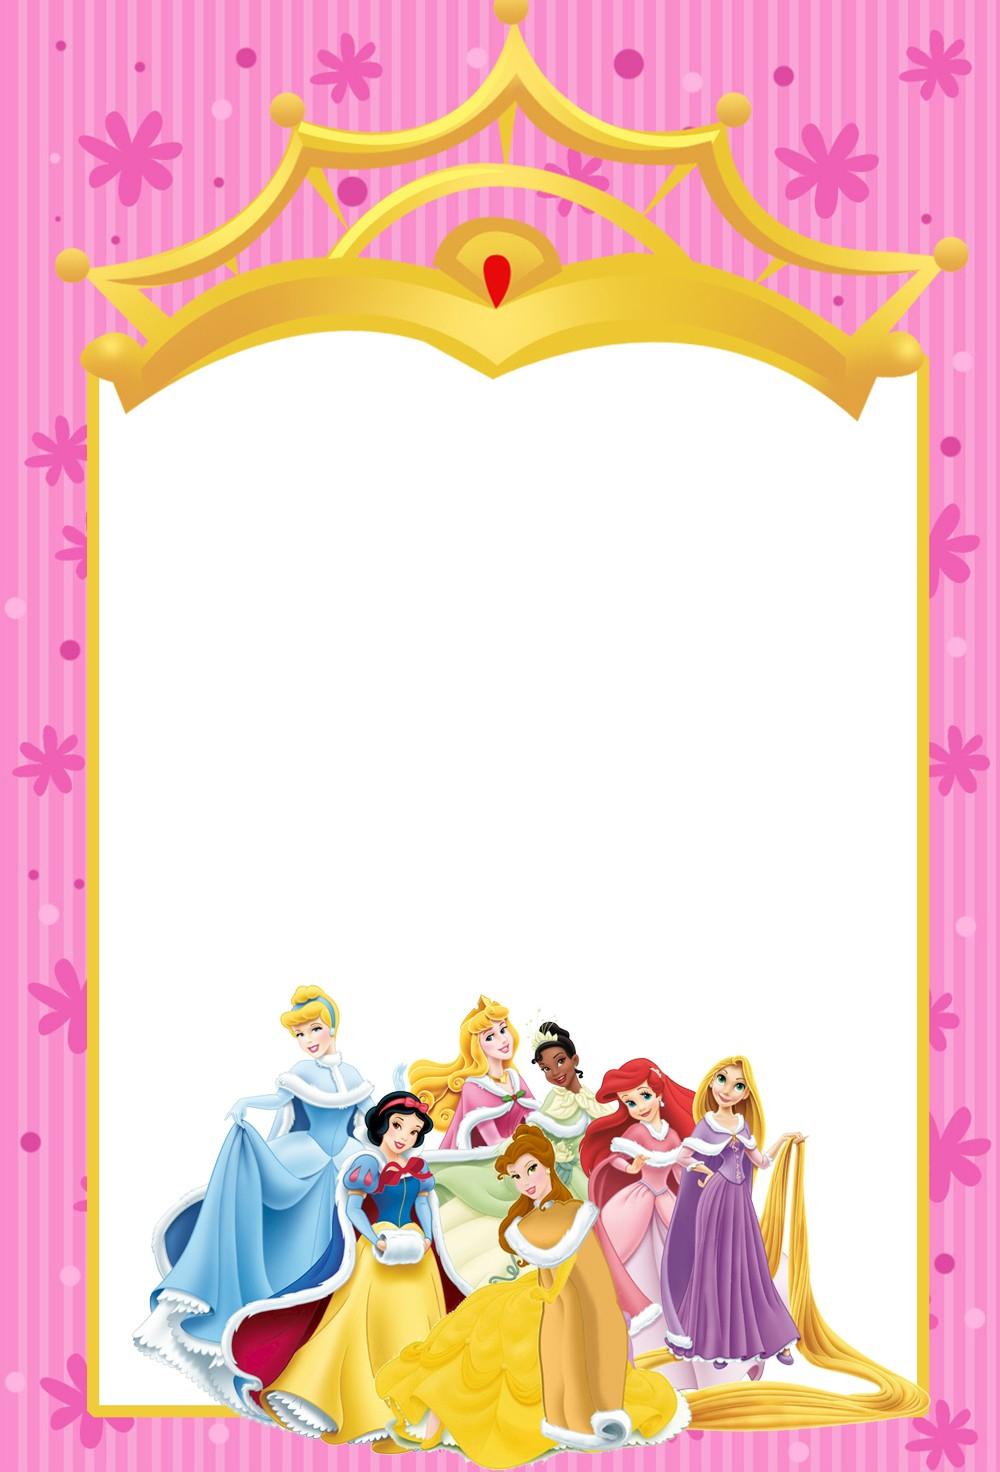 Free Disney Invitation Templates F Cool Disney Princess Birthday - Free Printable Disney Invitations